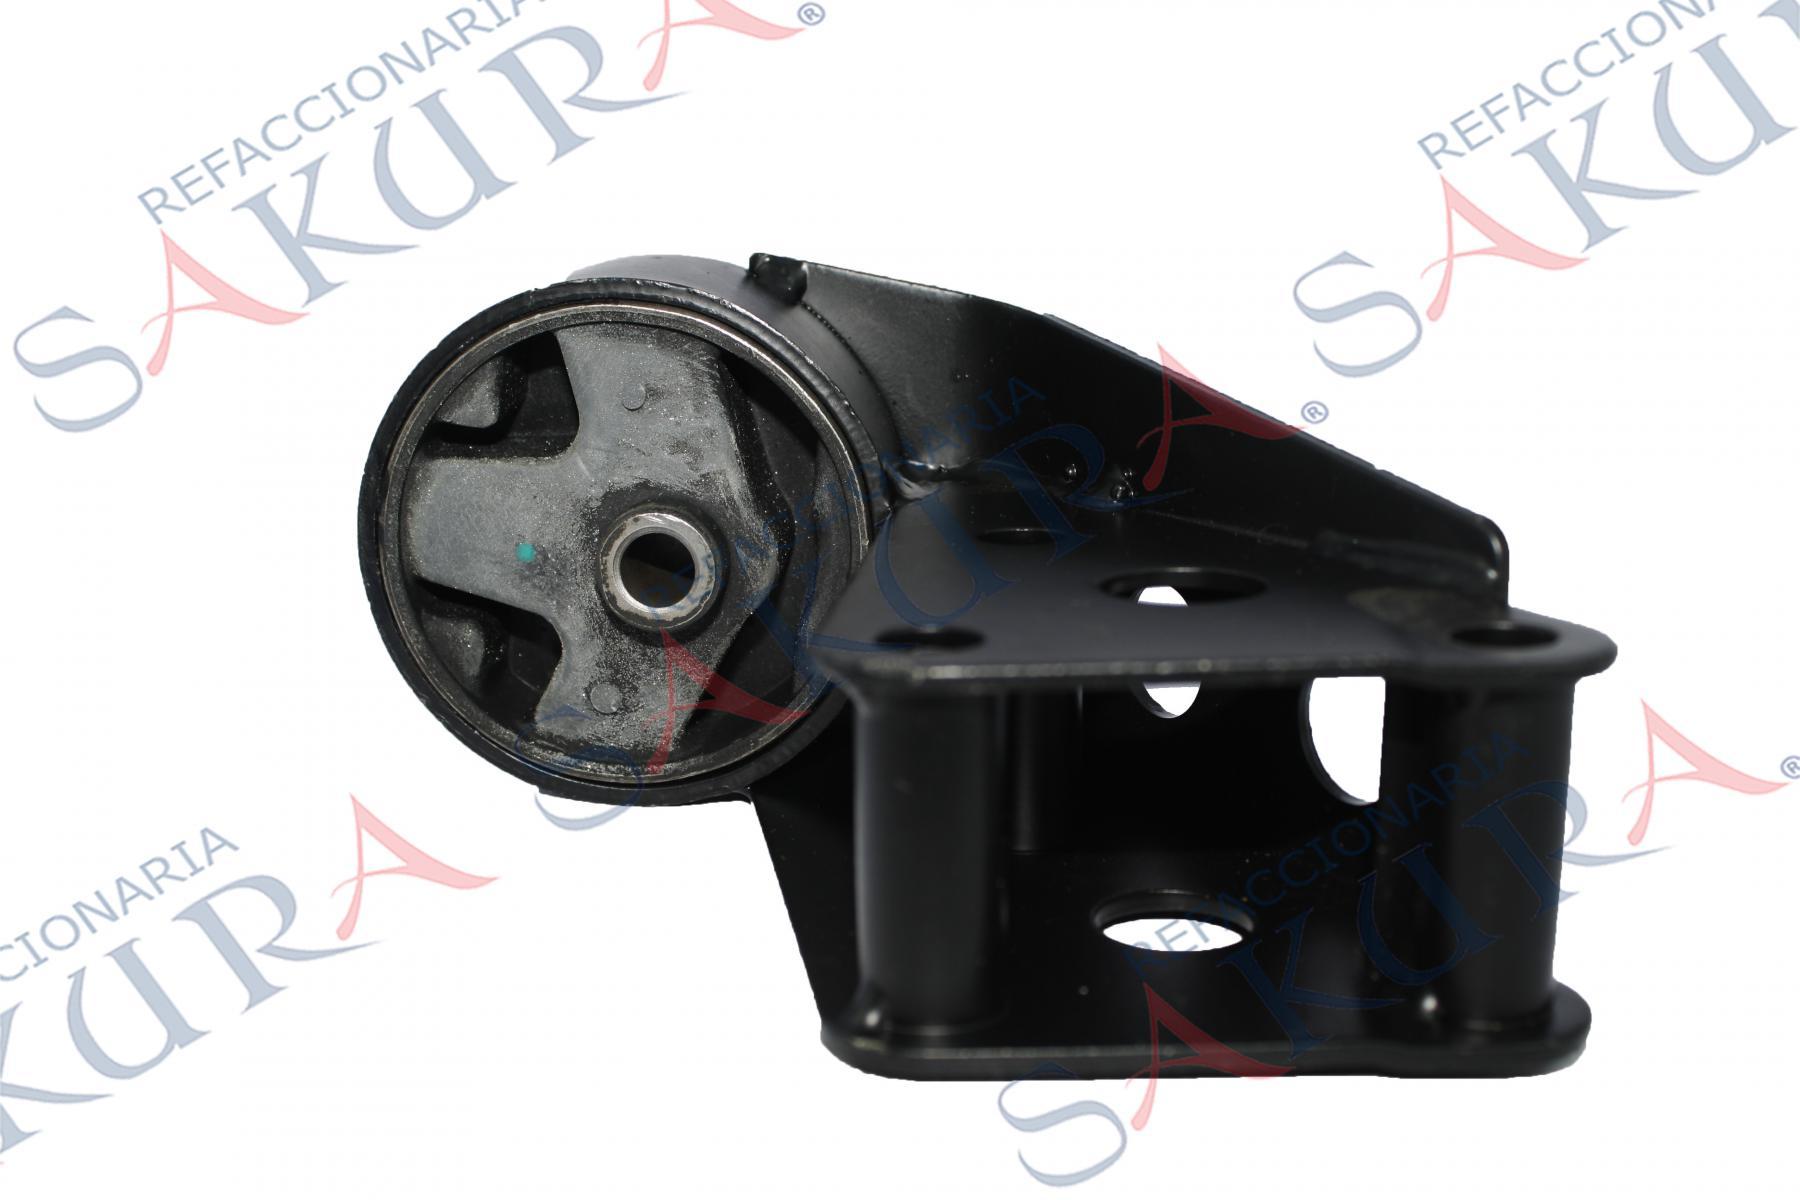 11220-F4101, Soporte Caja Velocidades  (Safety)